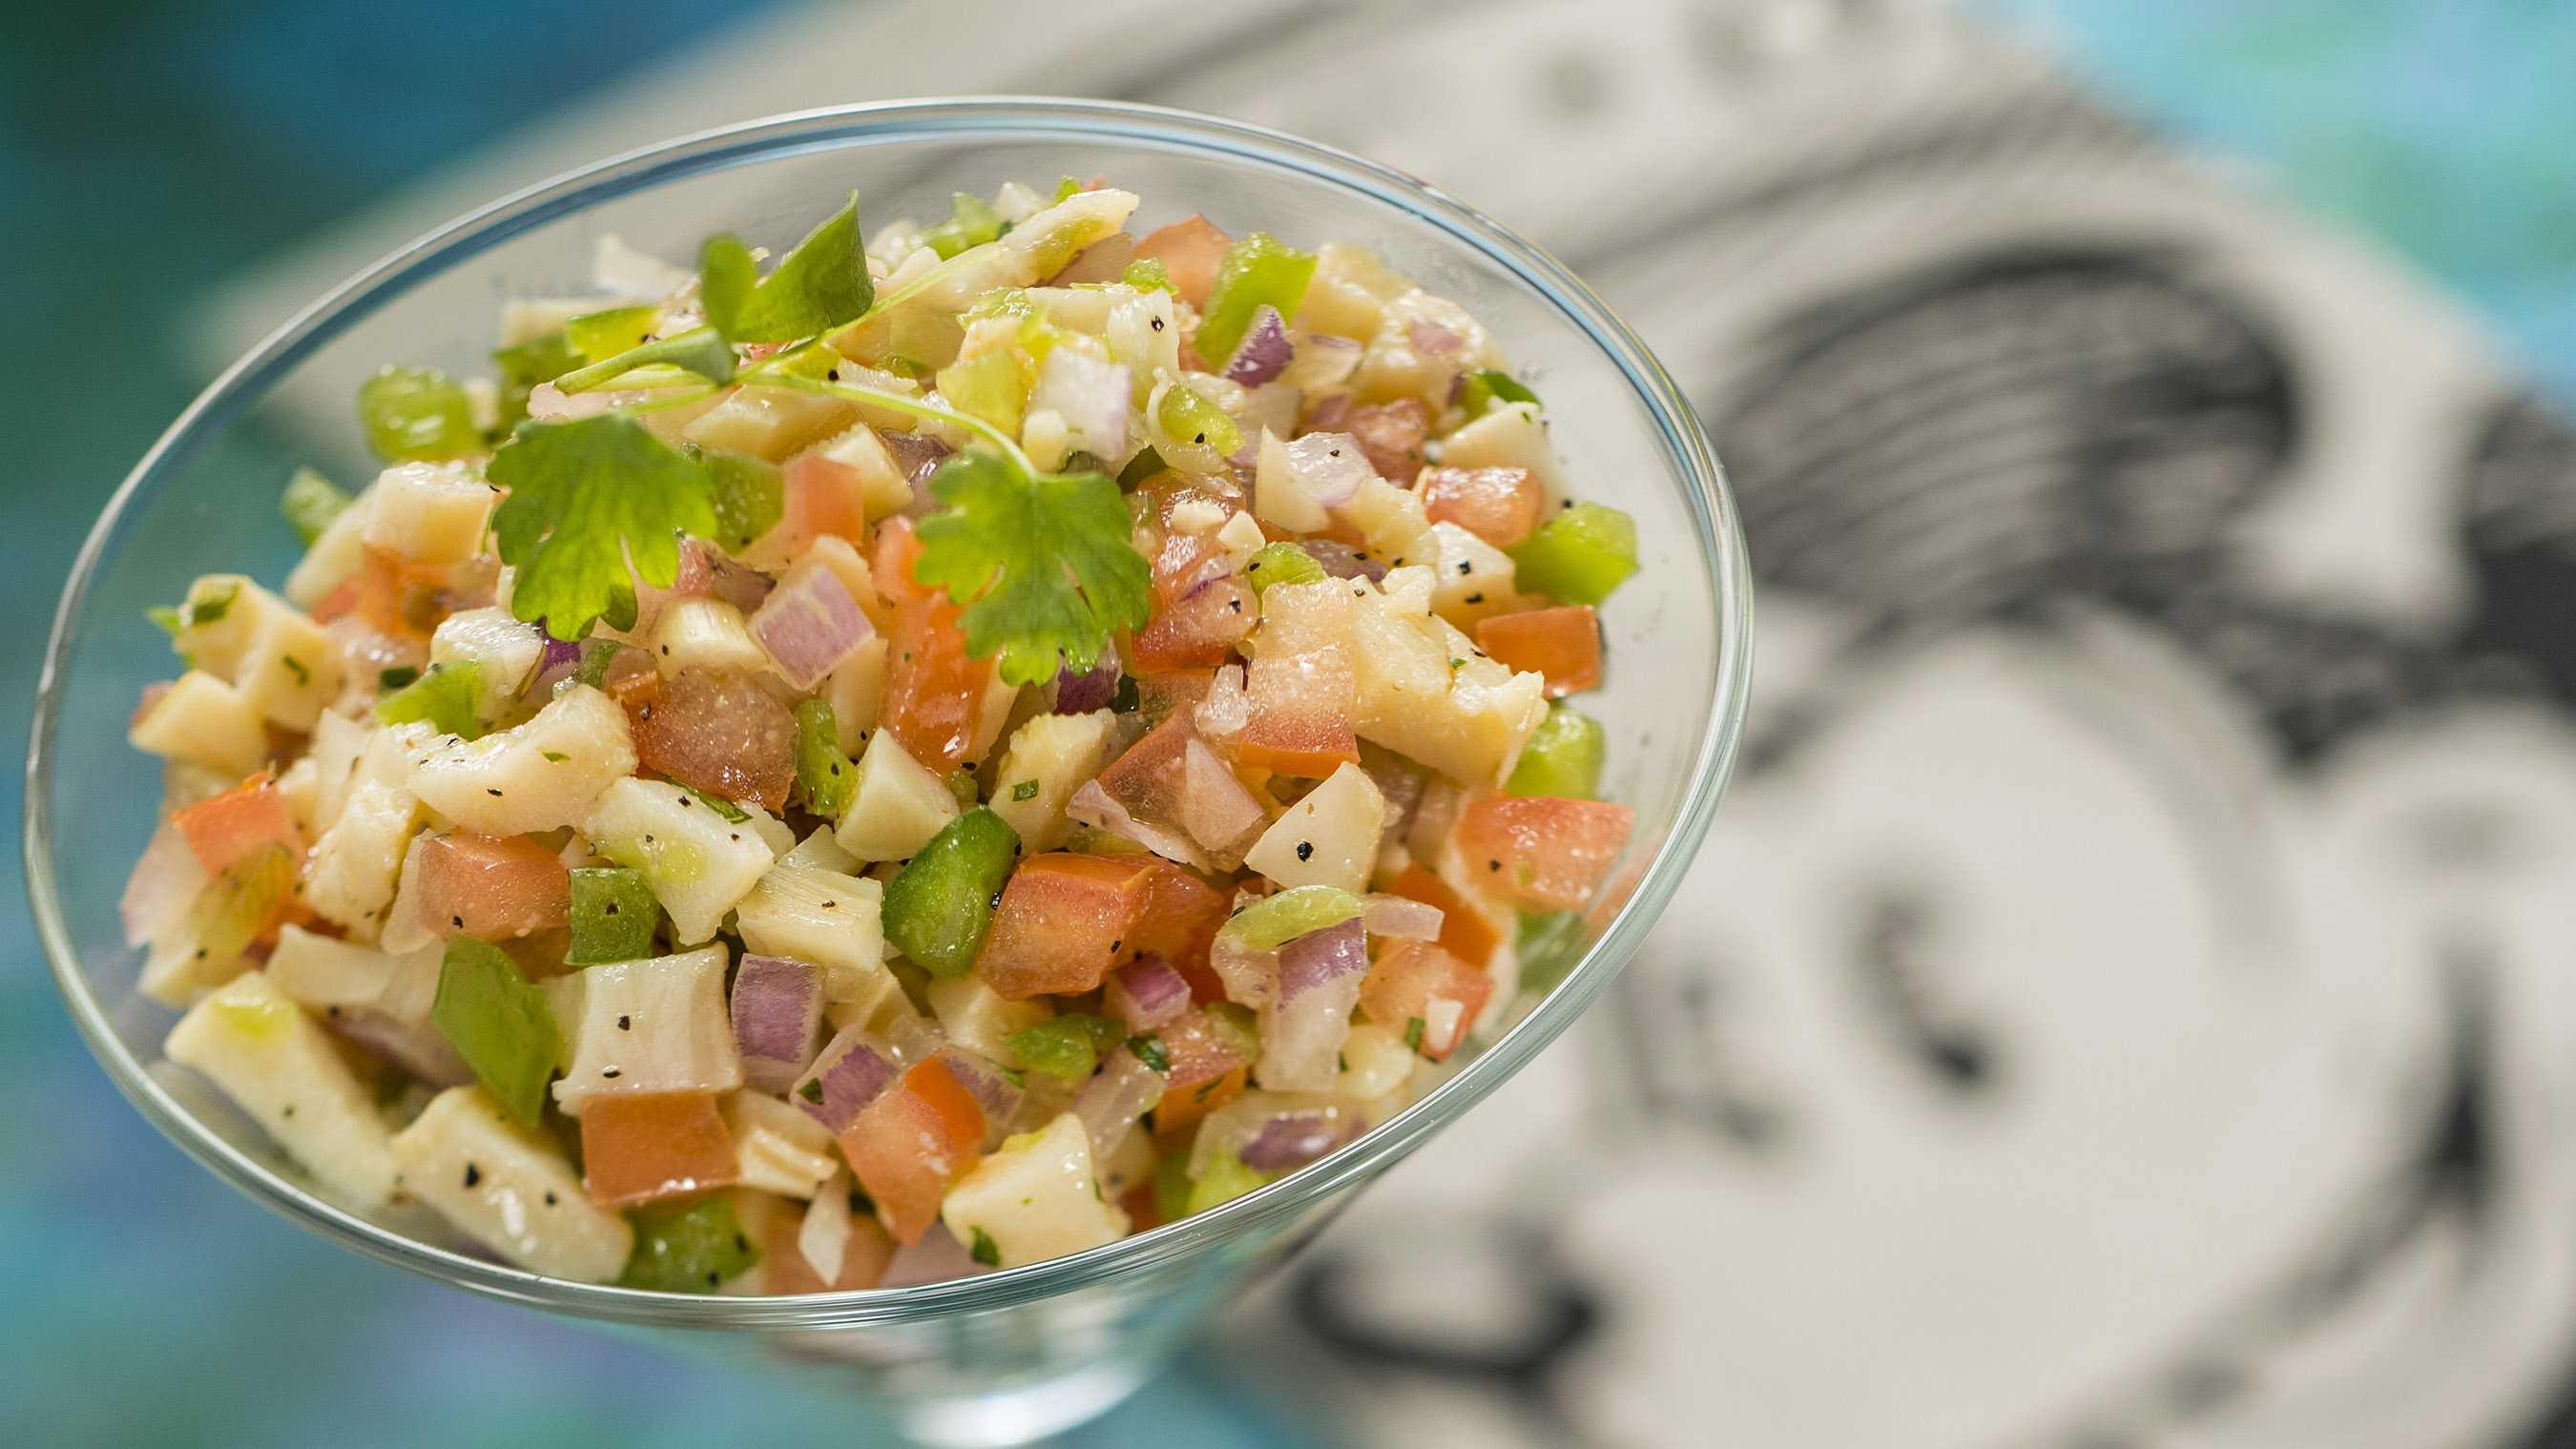 Puerto-Rico-conch-salad-0613ZW.jpg (1)